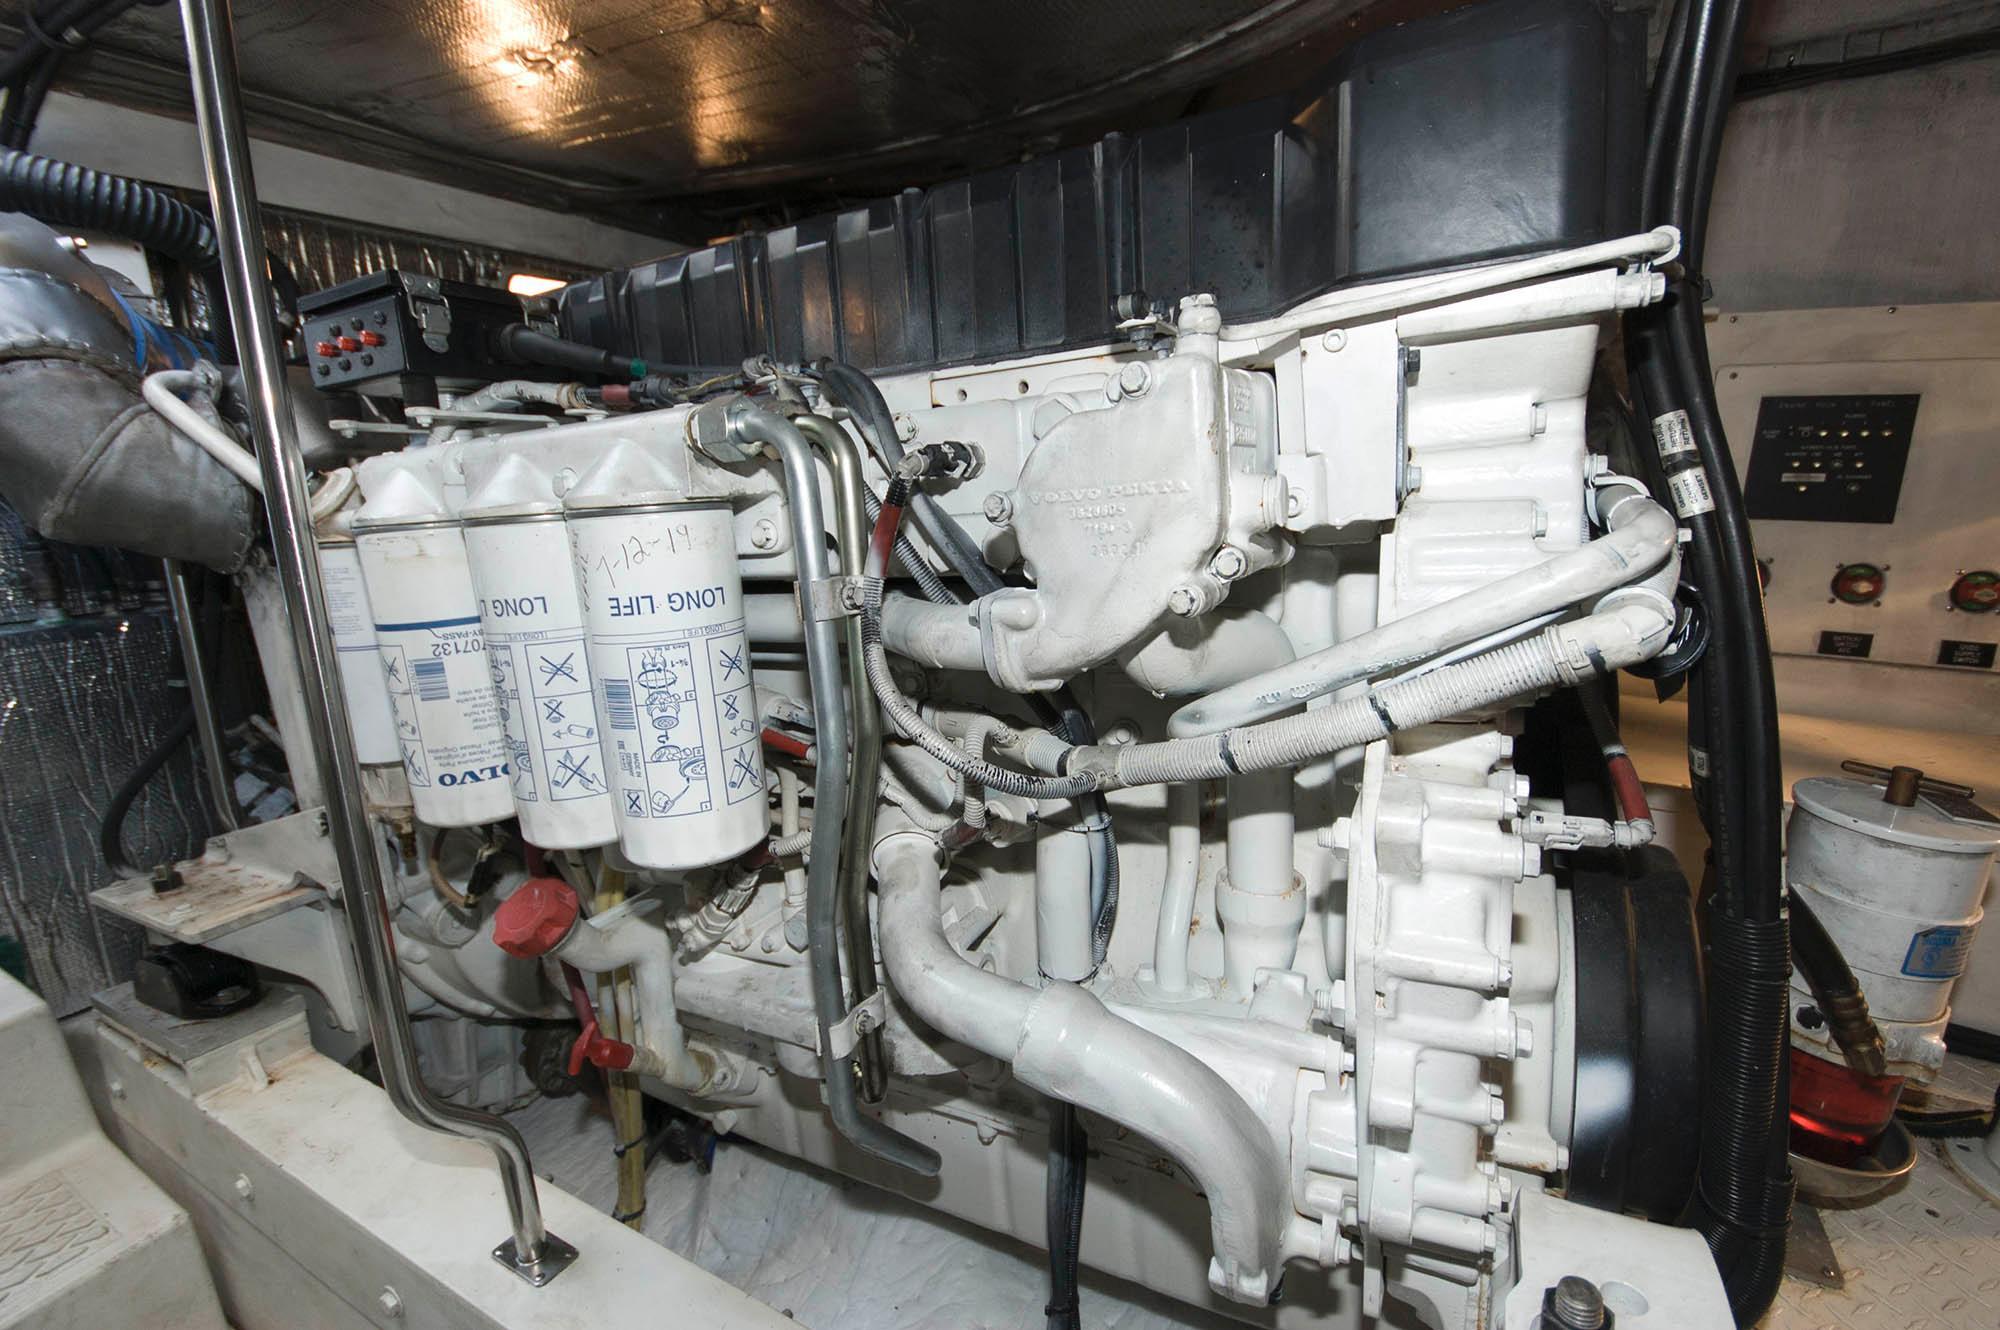 M 6558 EF Knot 10 Yacht Sales